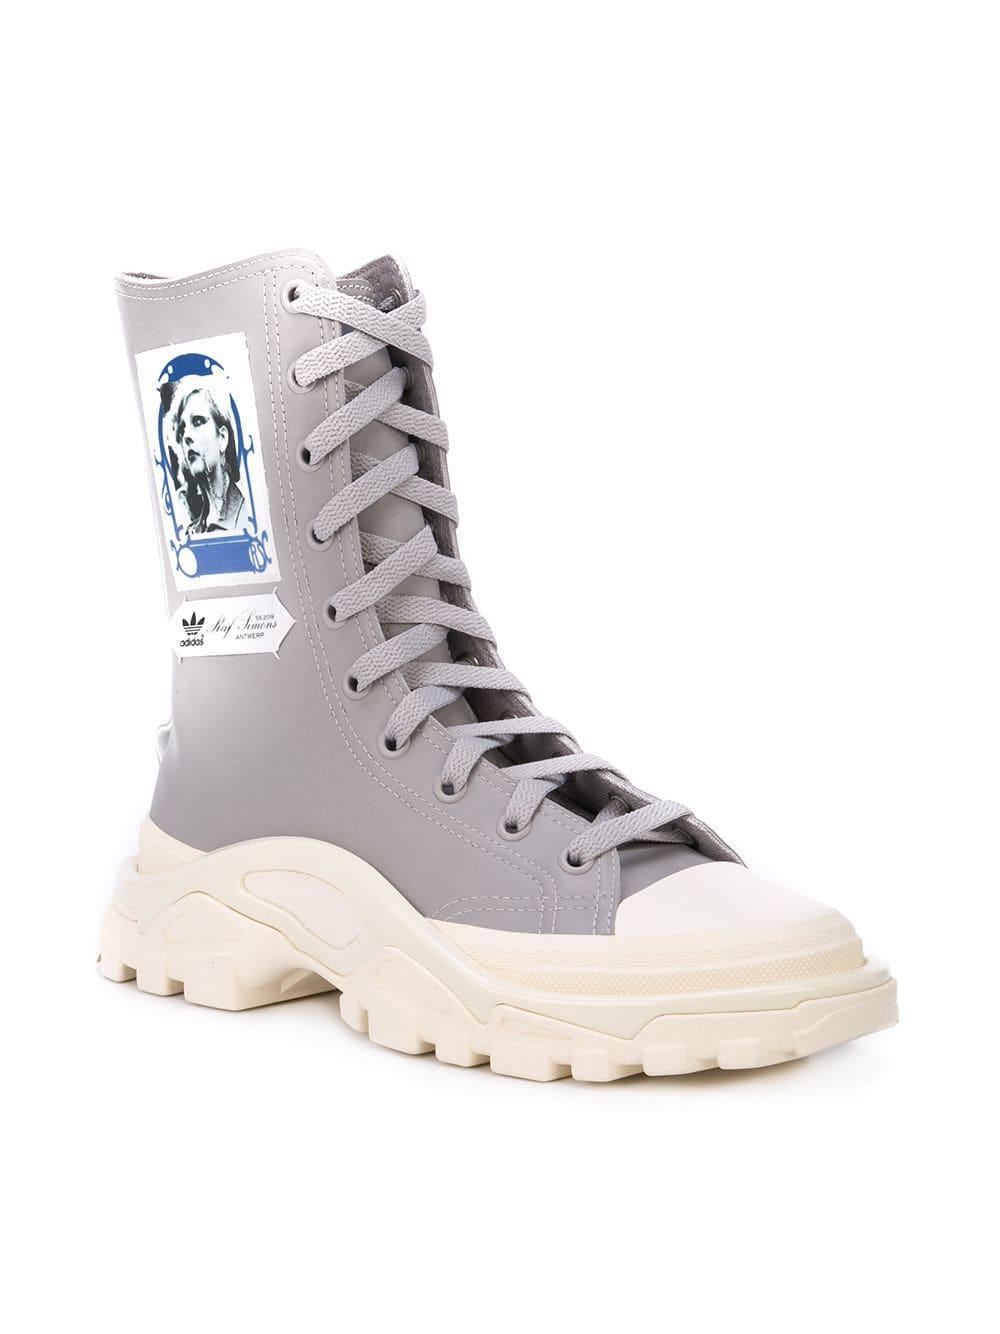 factory price 48800 034dd ... Grey X Raf Simons Detroit High Leather Sneakers. View fullscreen